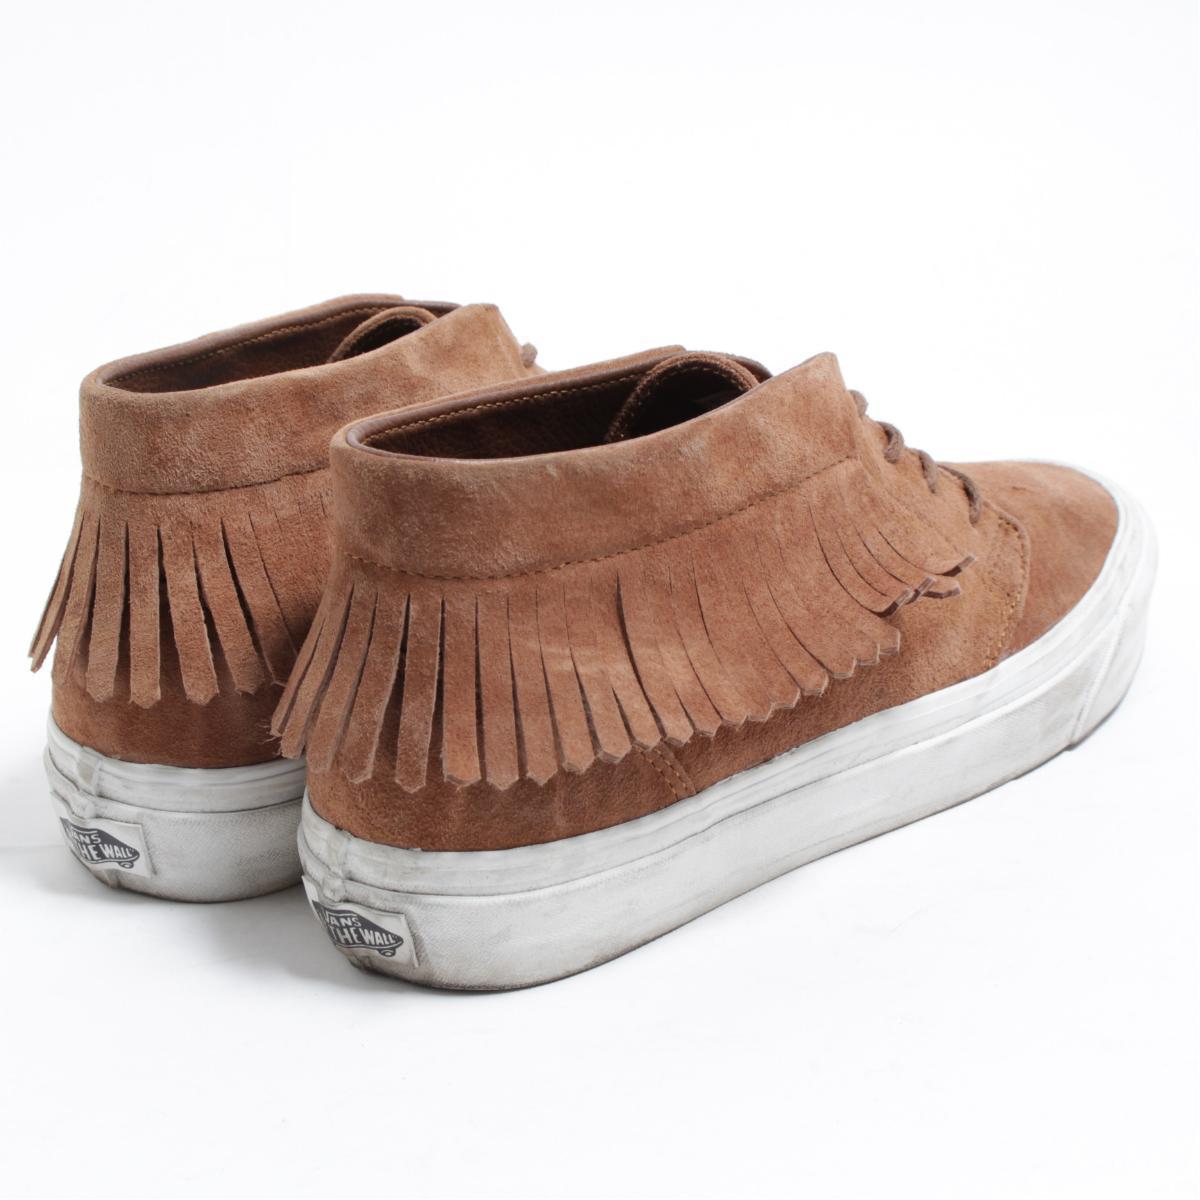 5482b8f8102909 Vans VANS CHUKKA MOC DX fringe suede sneakers US7 .5 men s 25.5cm  bom8257